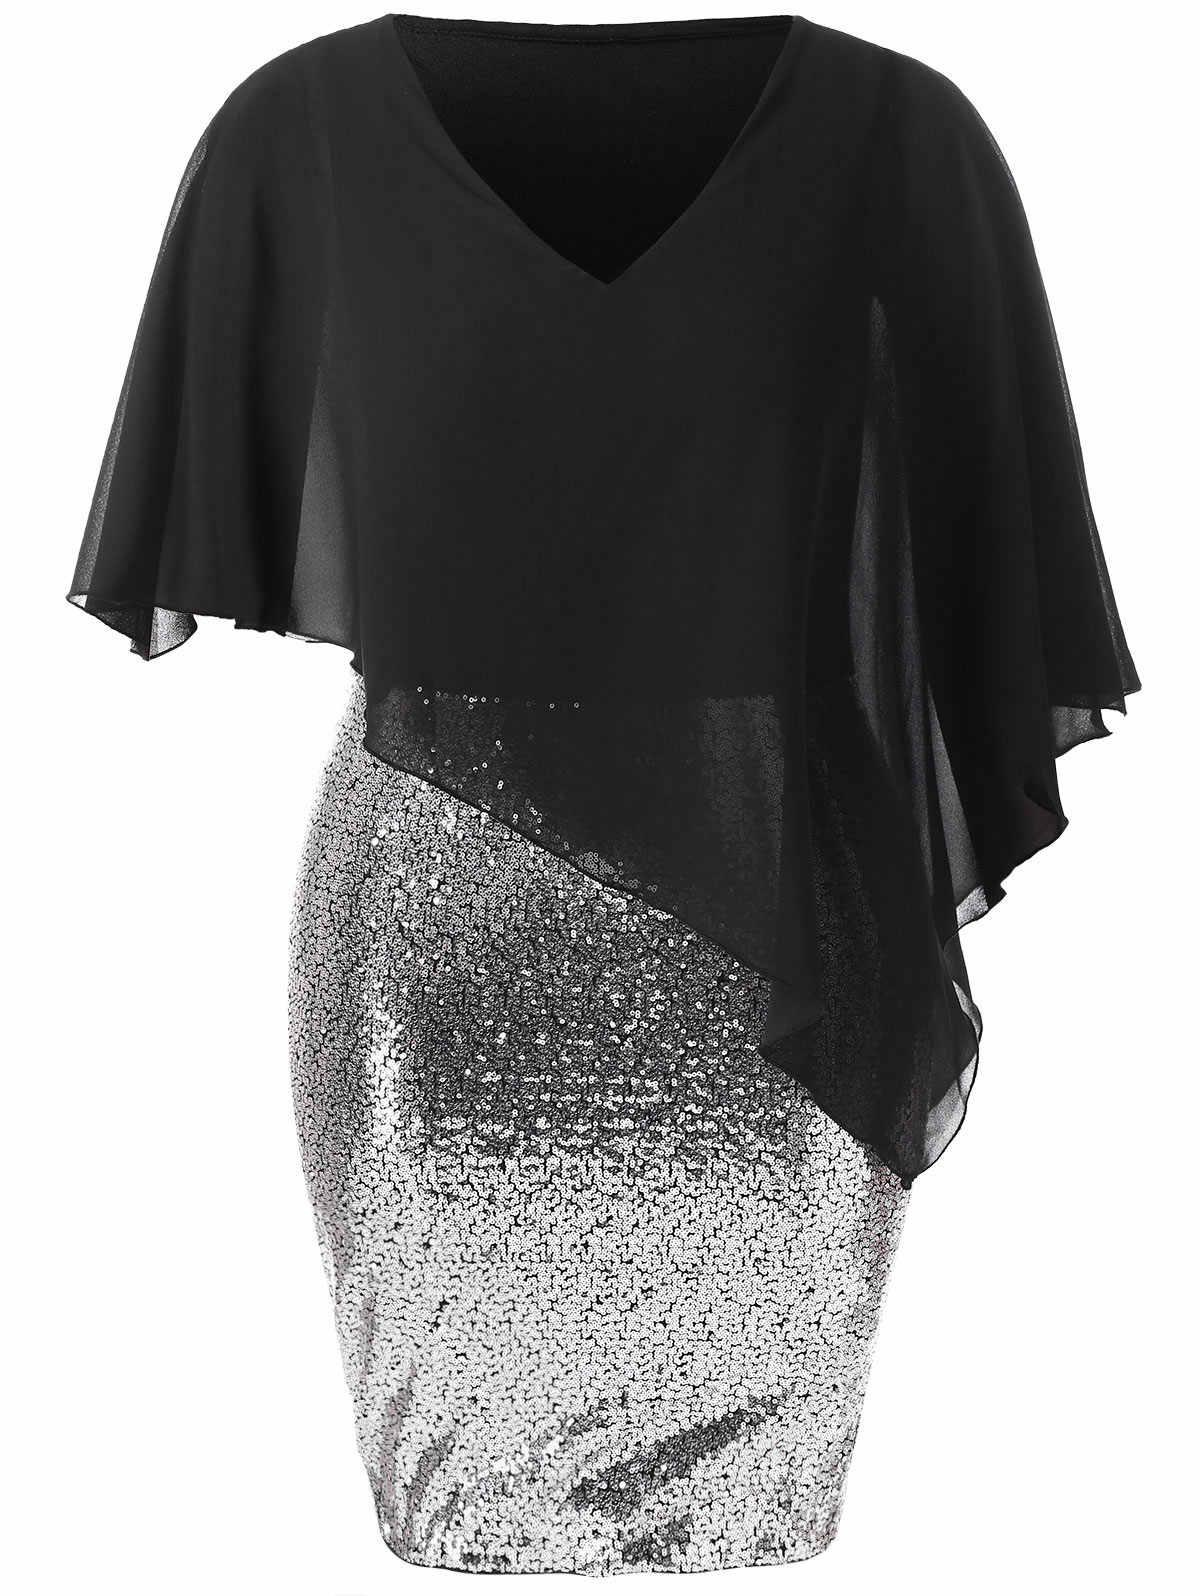 2f42f23b160ab ... Wipalo Plus Size Chiffon Overlay Sequin Capelet Dress Women Bodycon  Dress V-Neck Party Dresses ...